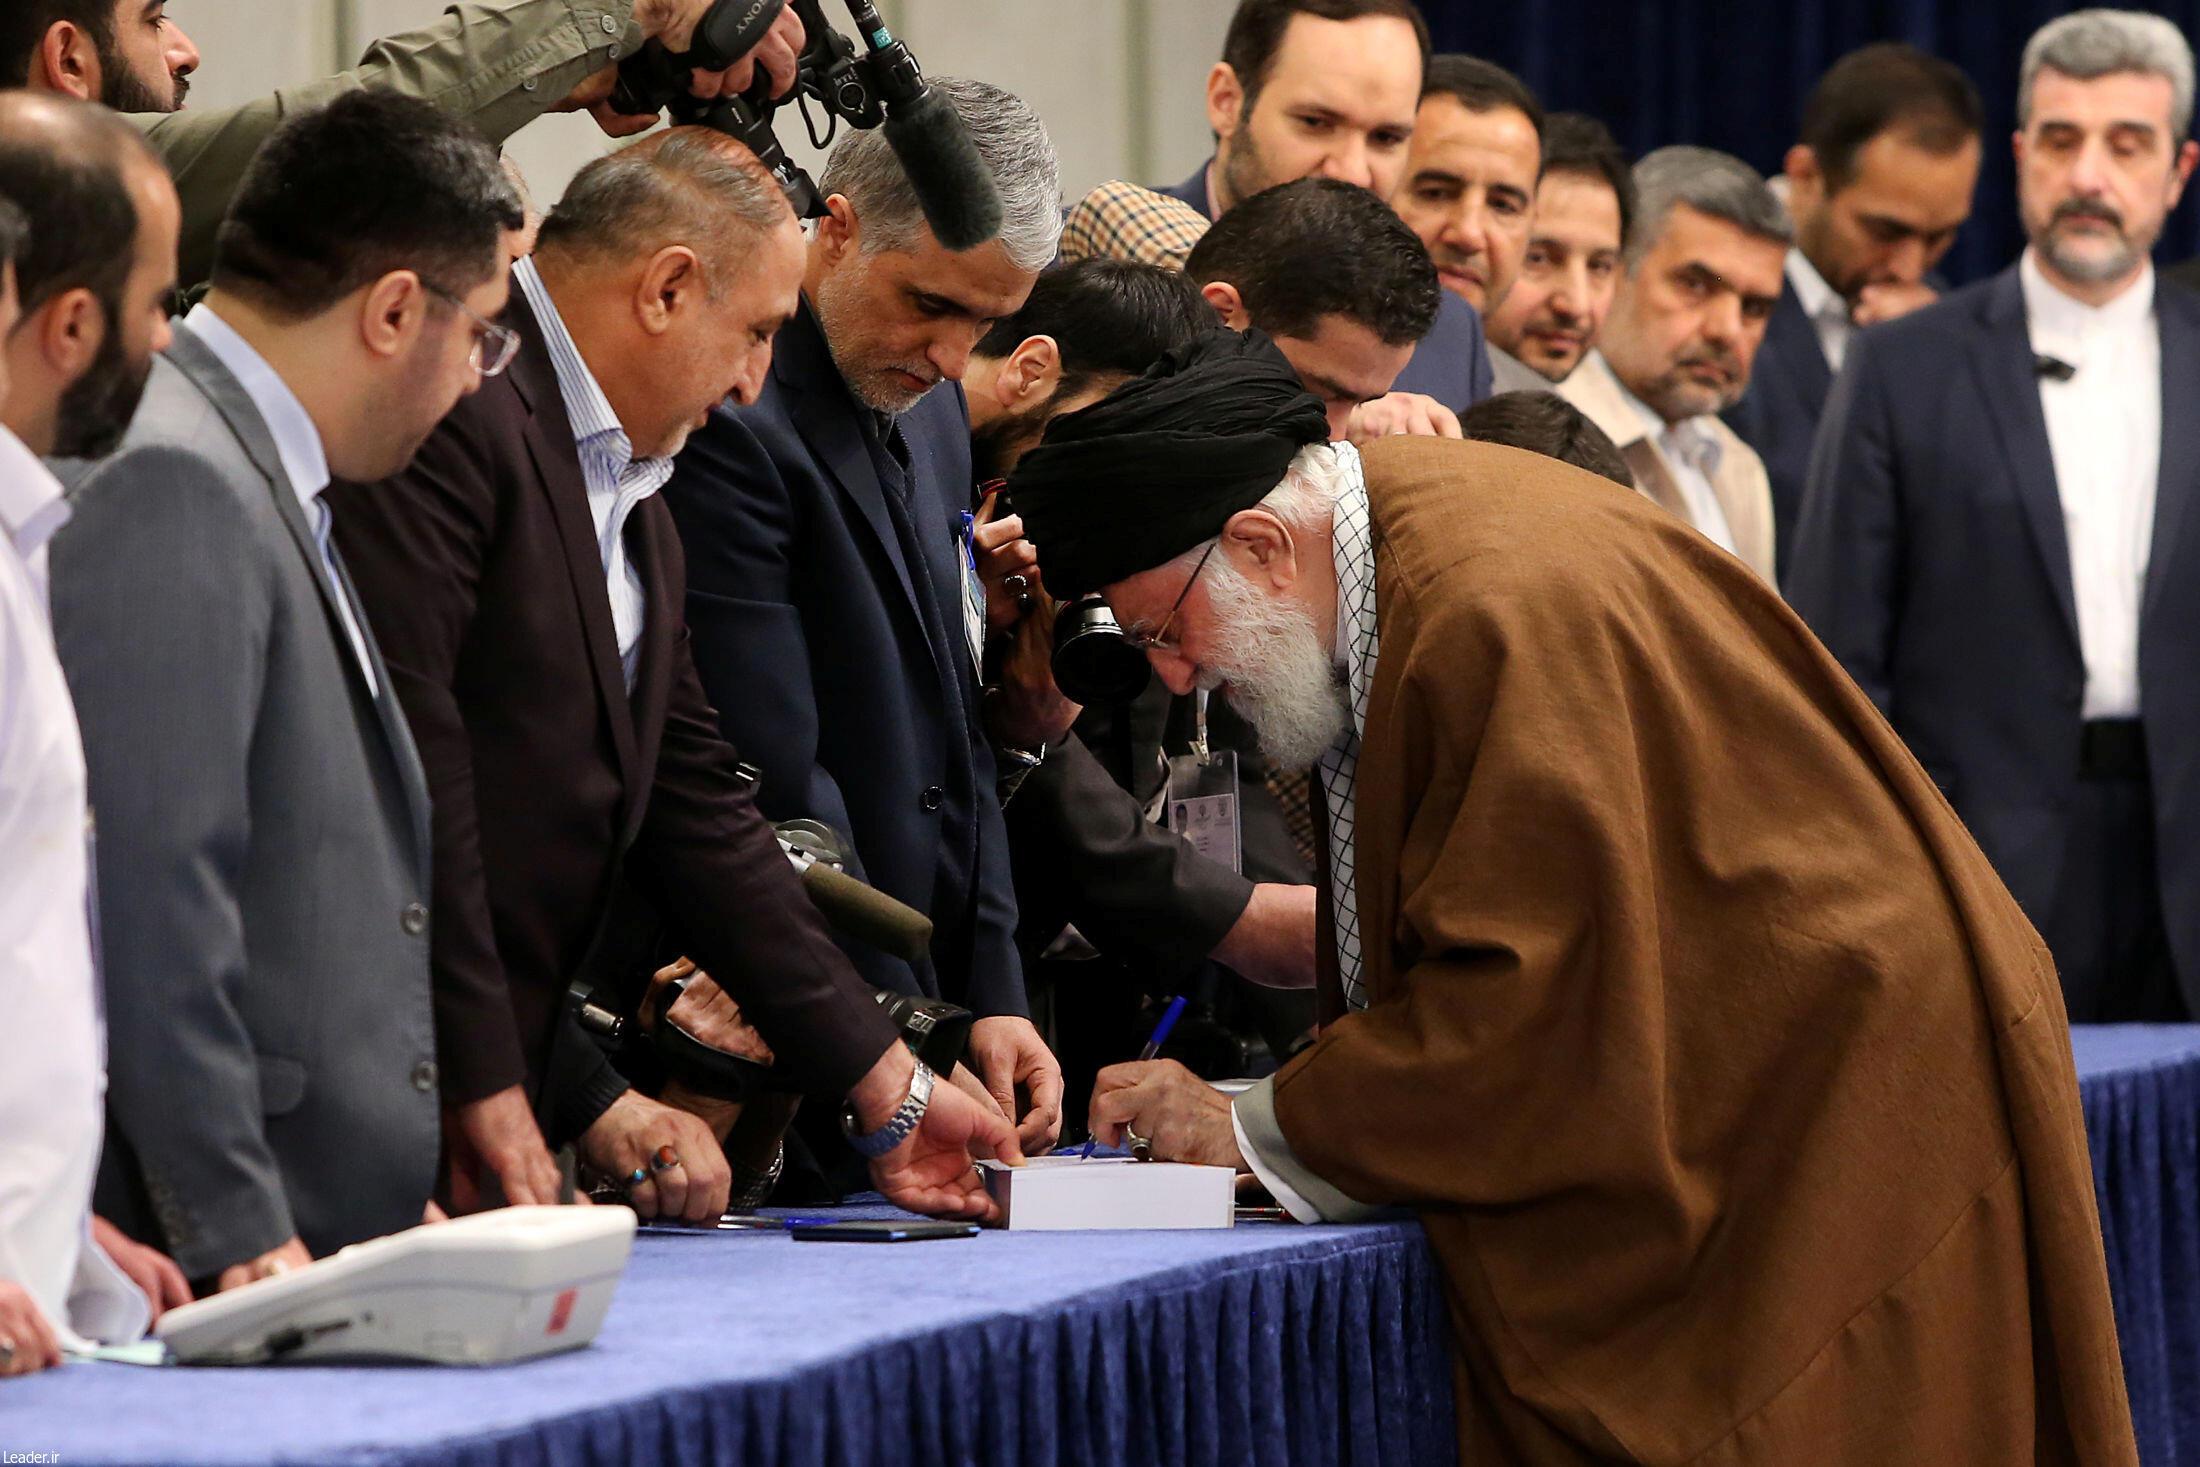 Ayatollah Ali Khamenei, Iran's Supreme Leader, cast his vote near his office in Tehran.